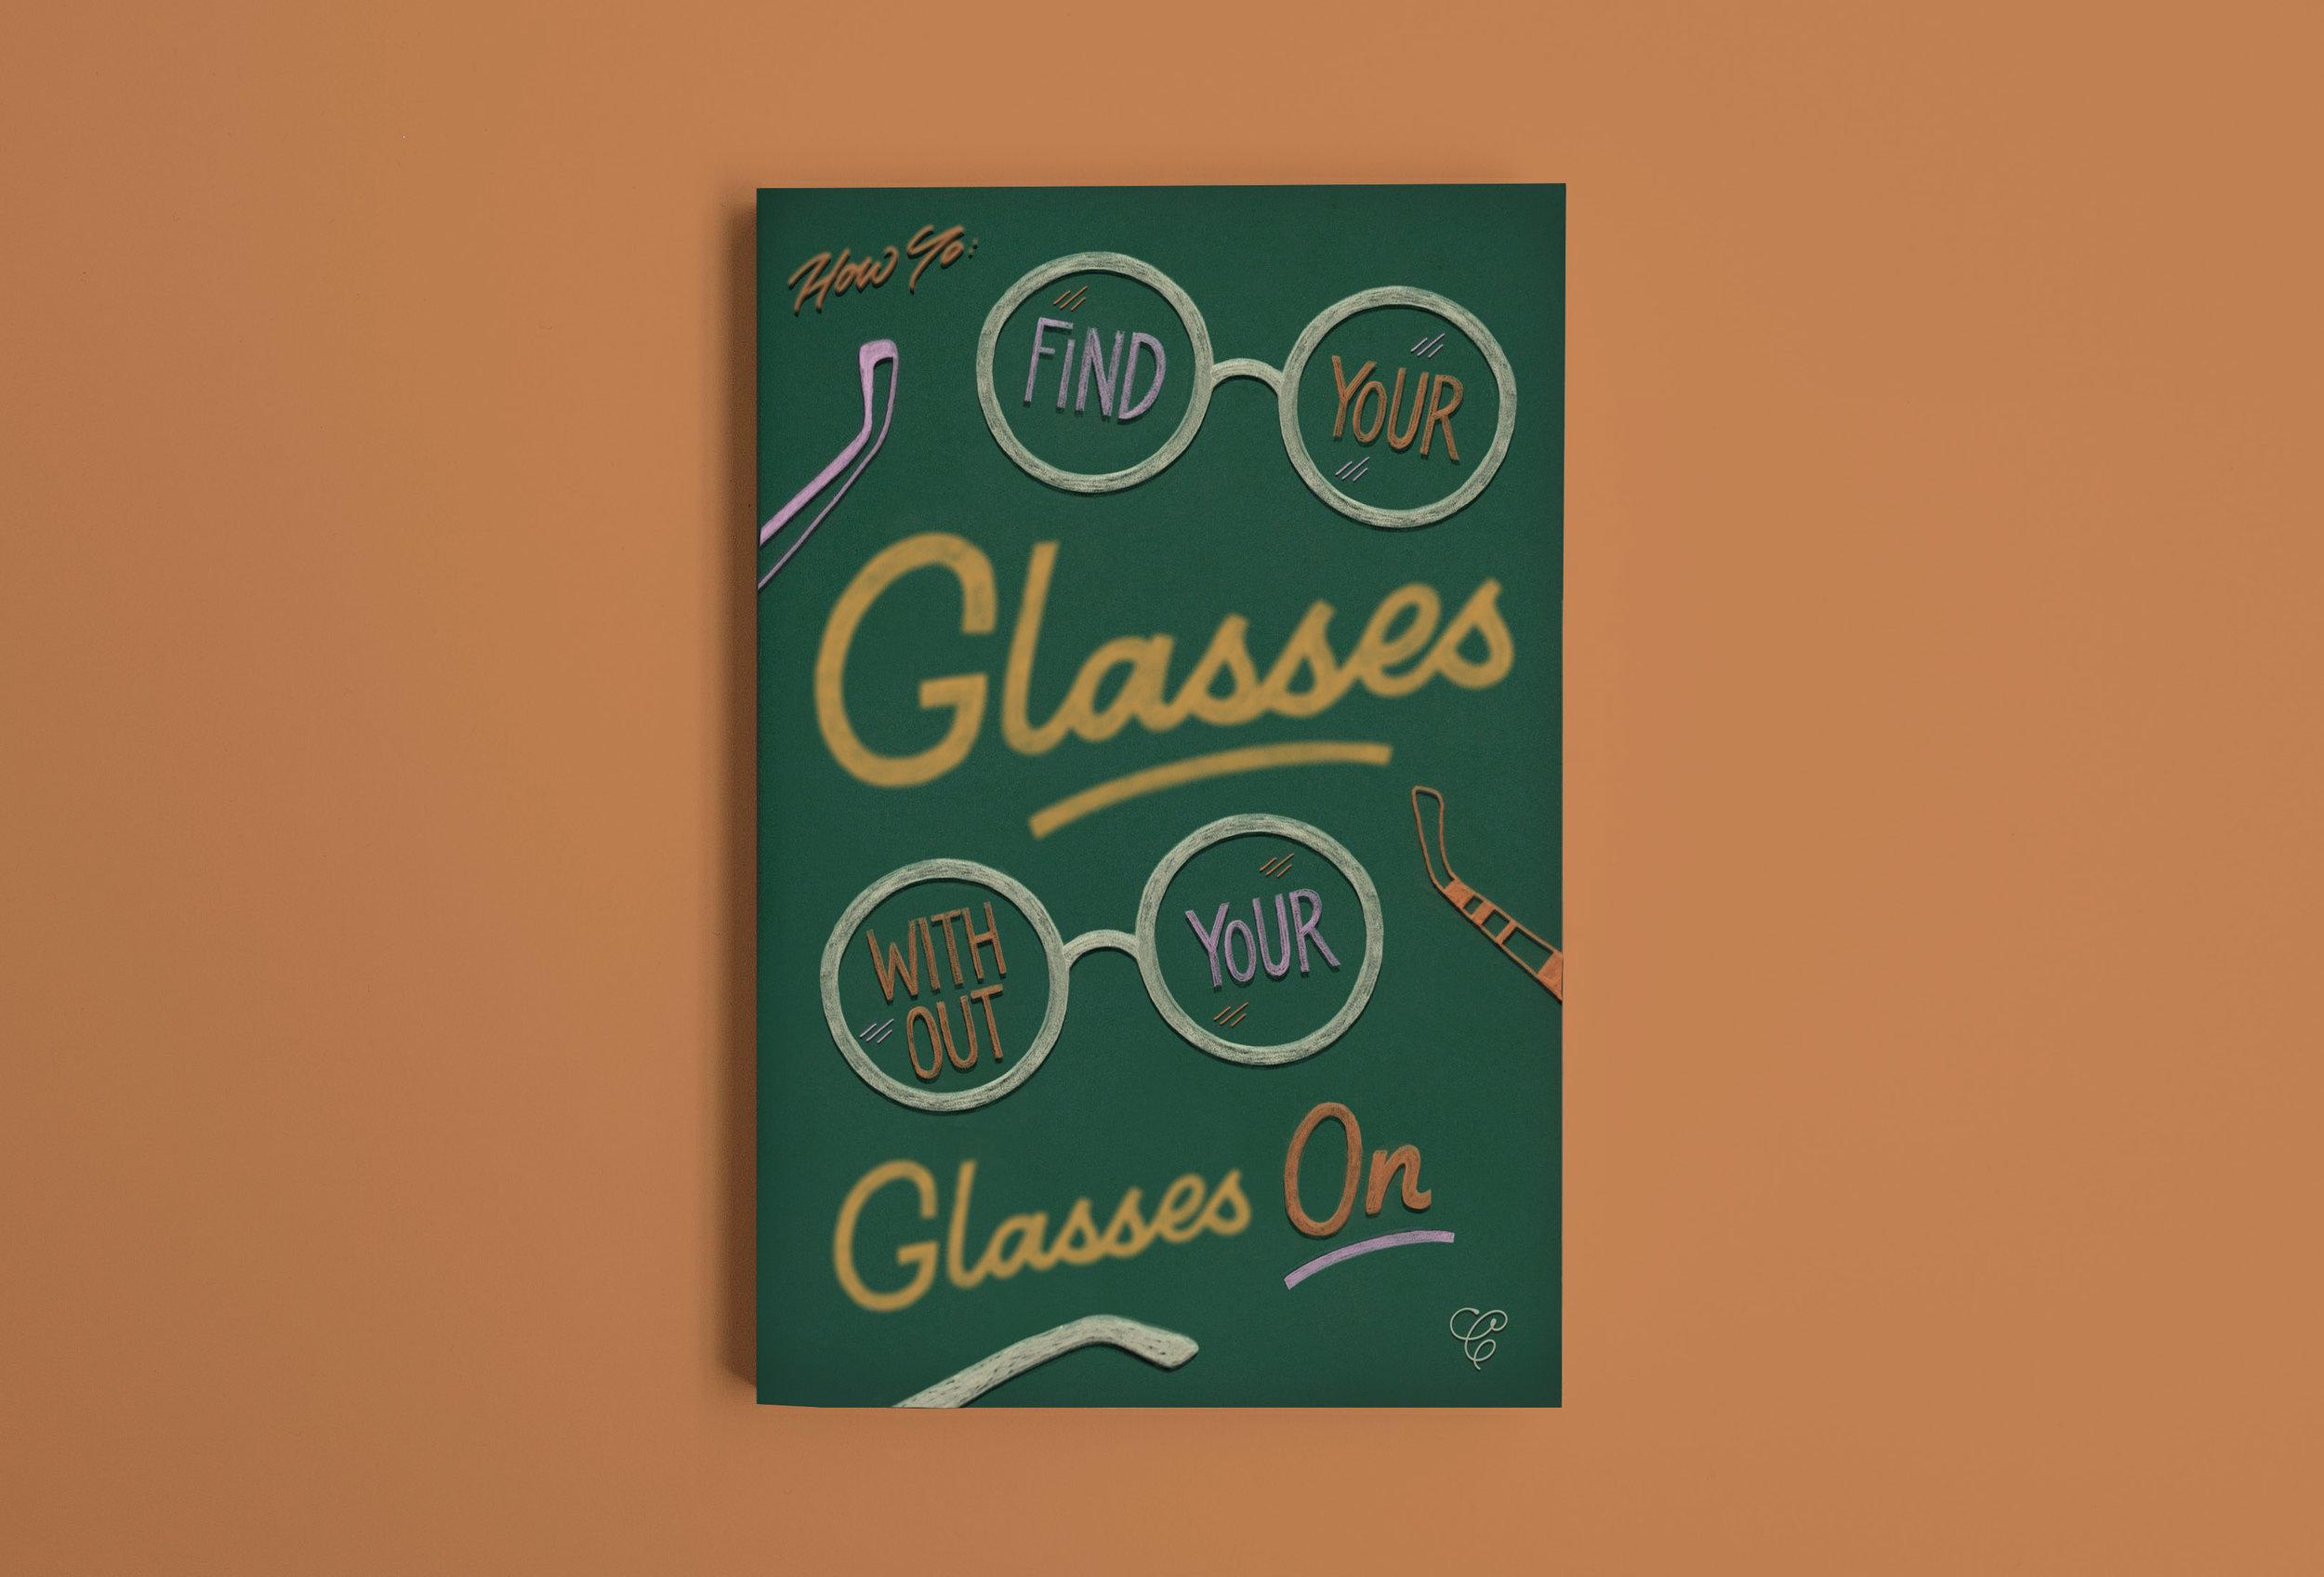 glasses_Blurred_tumblr.jpg